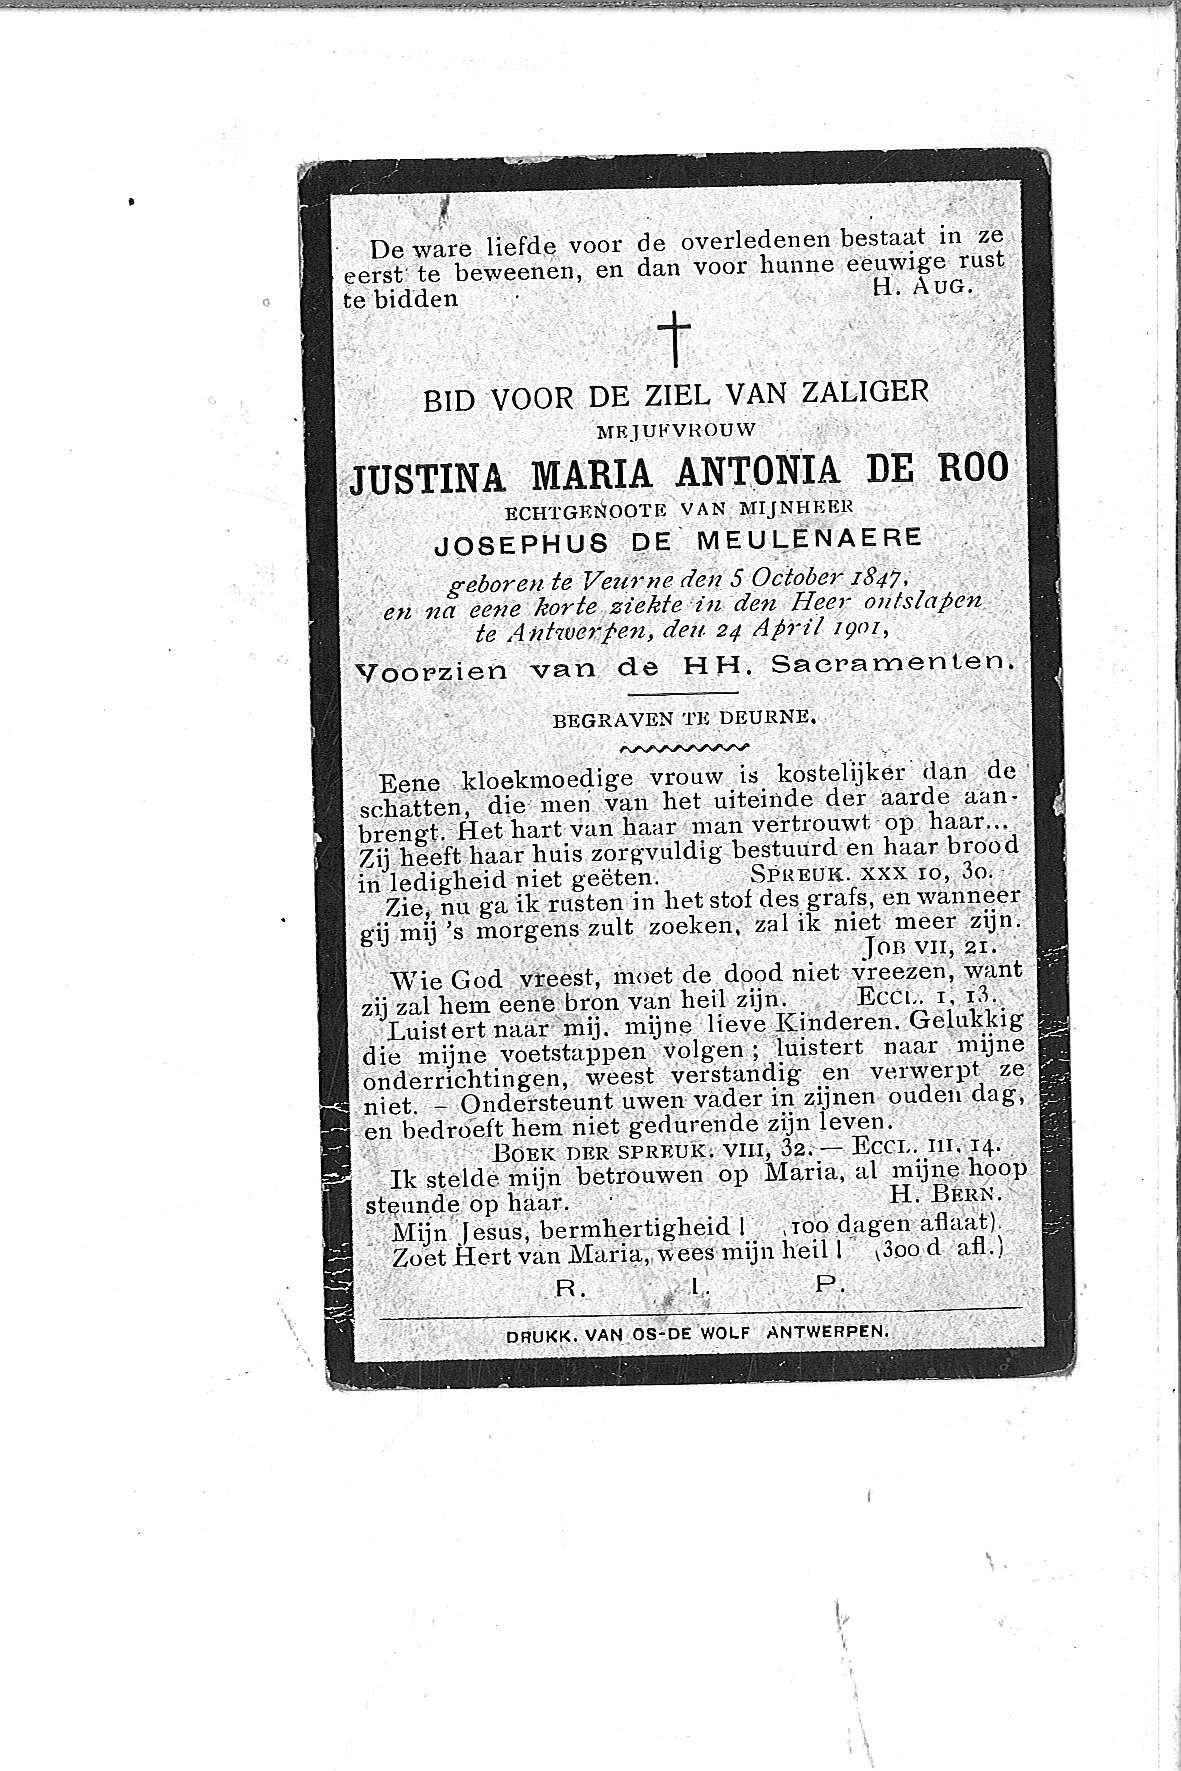 Justina Maria Antonia(1901)20131217152551_00026.jpg